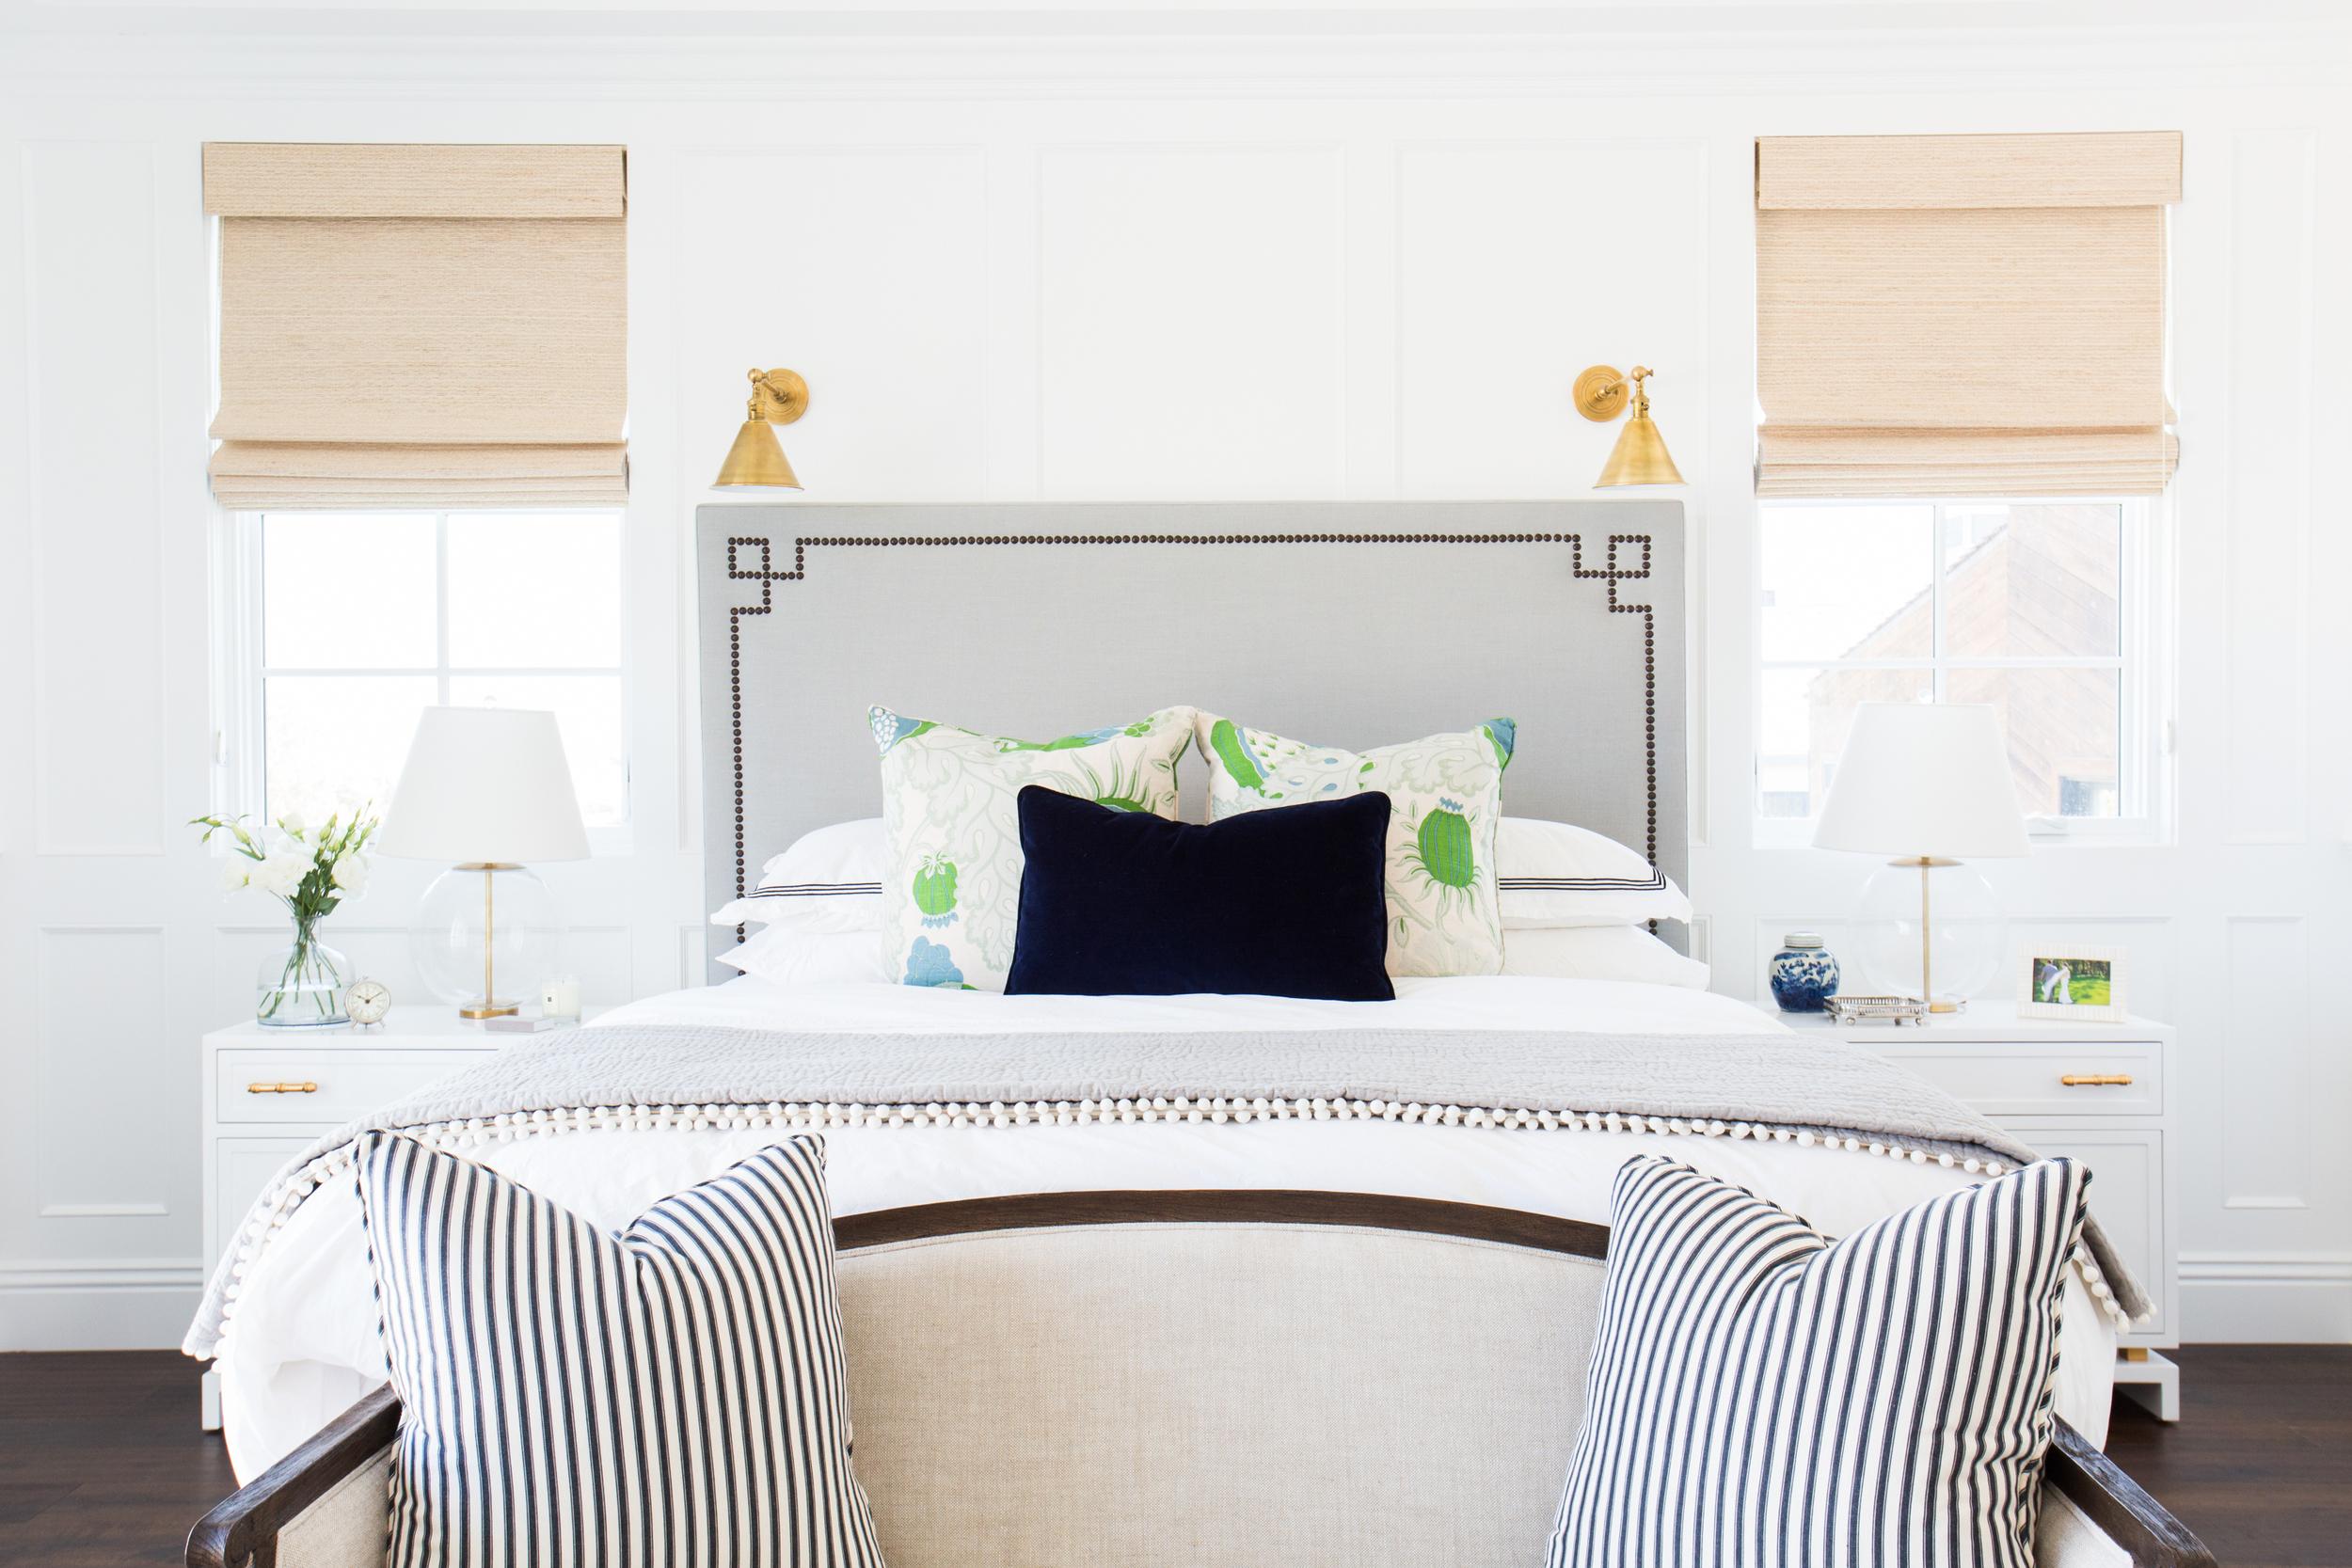 Studio McGee - Pacific Palisades Master Bedroom